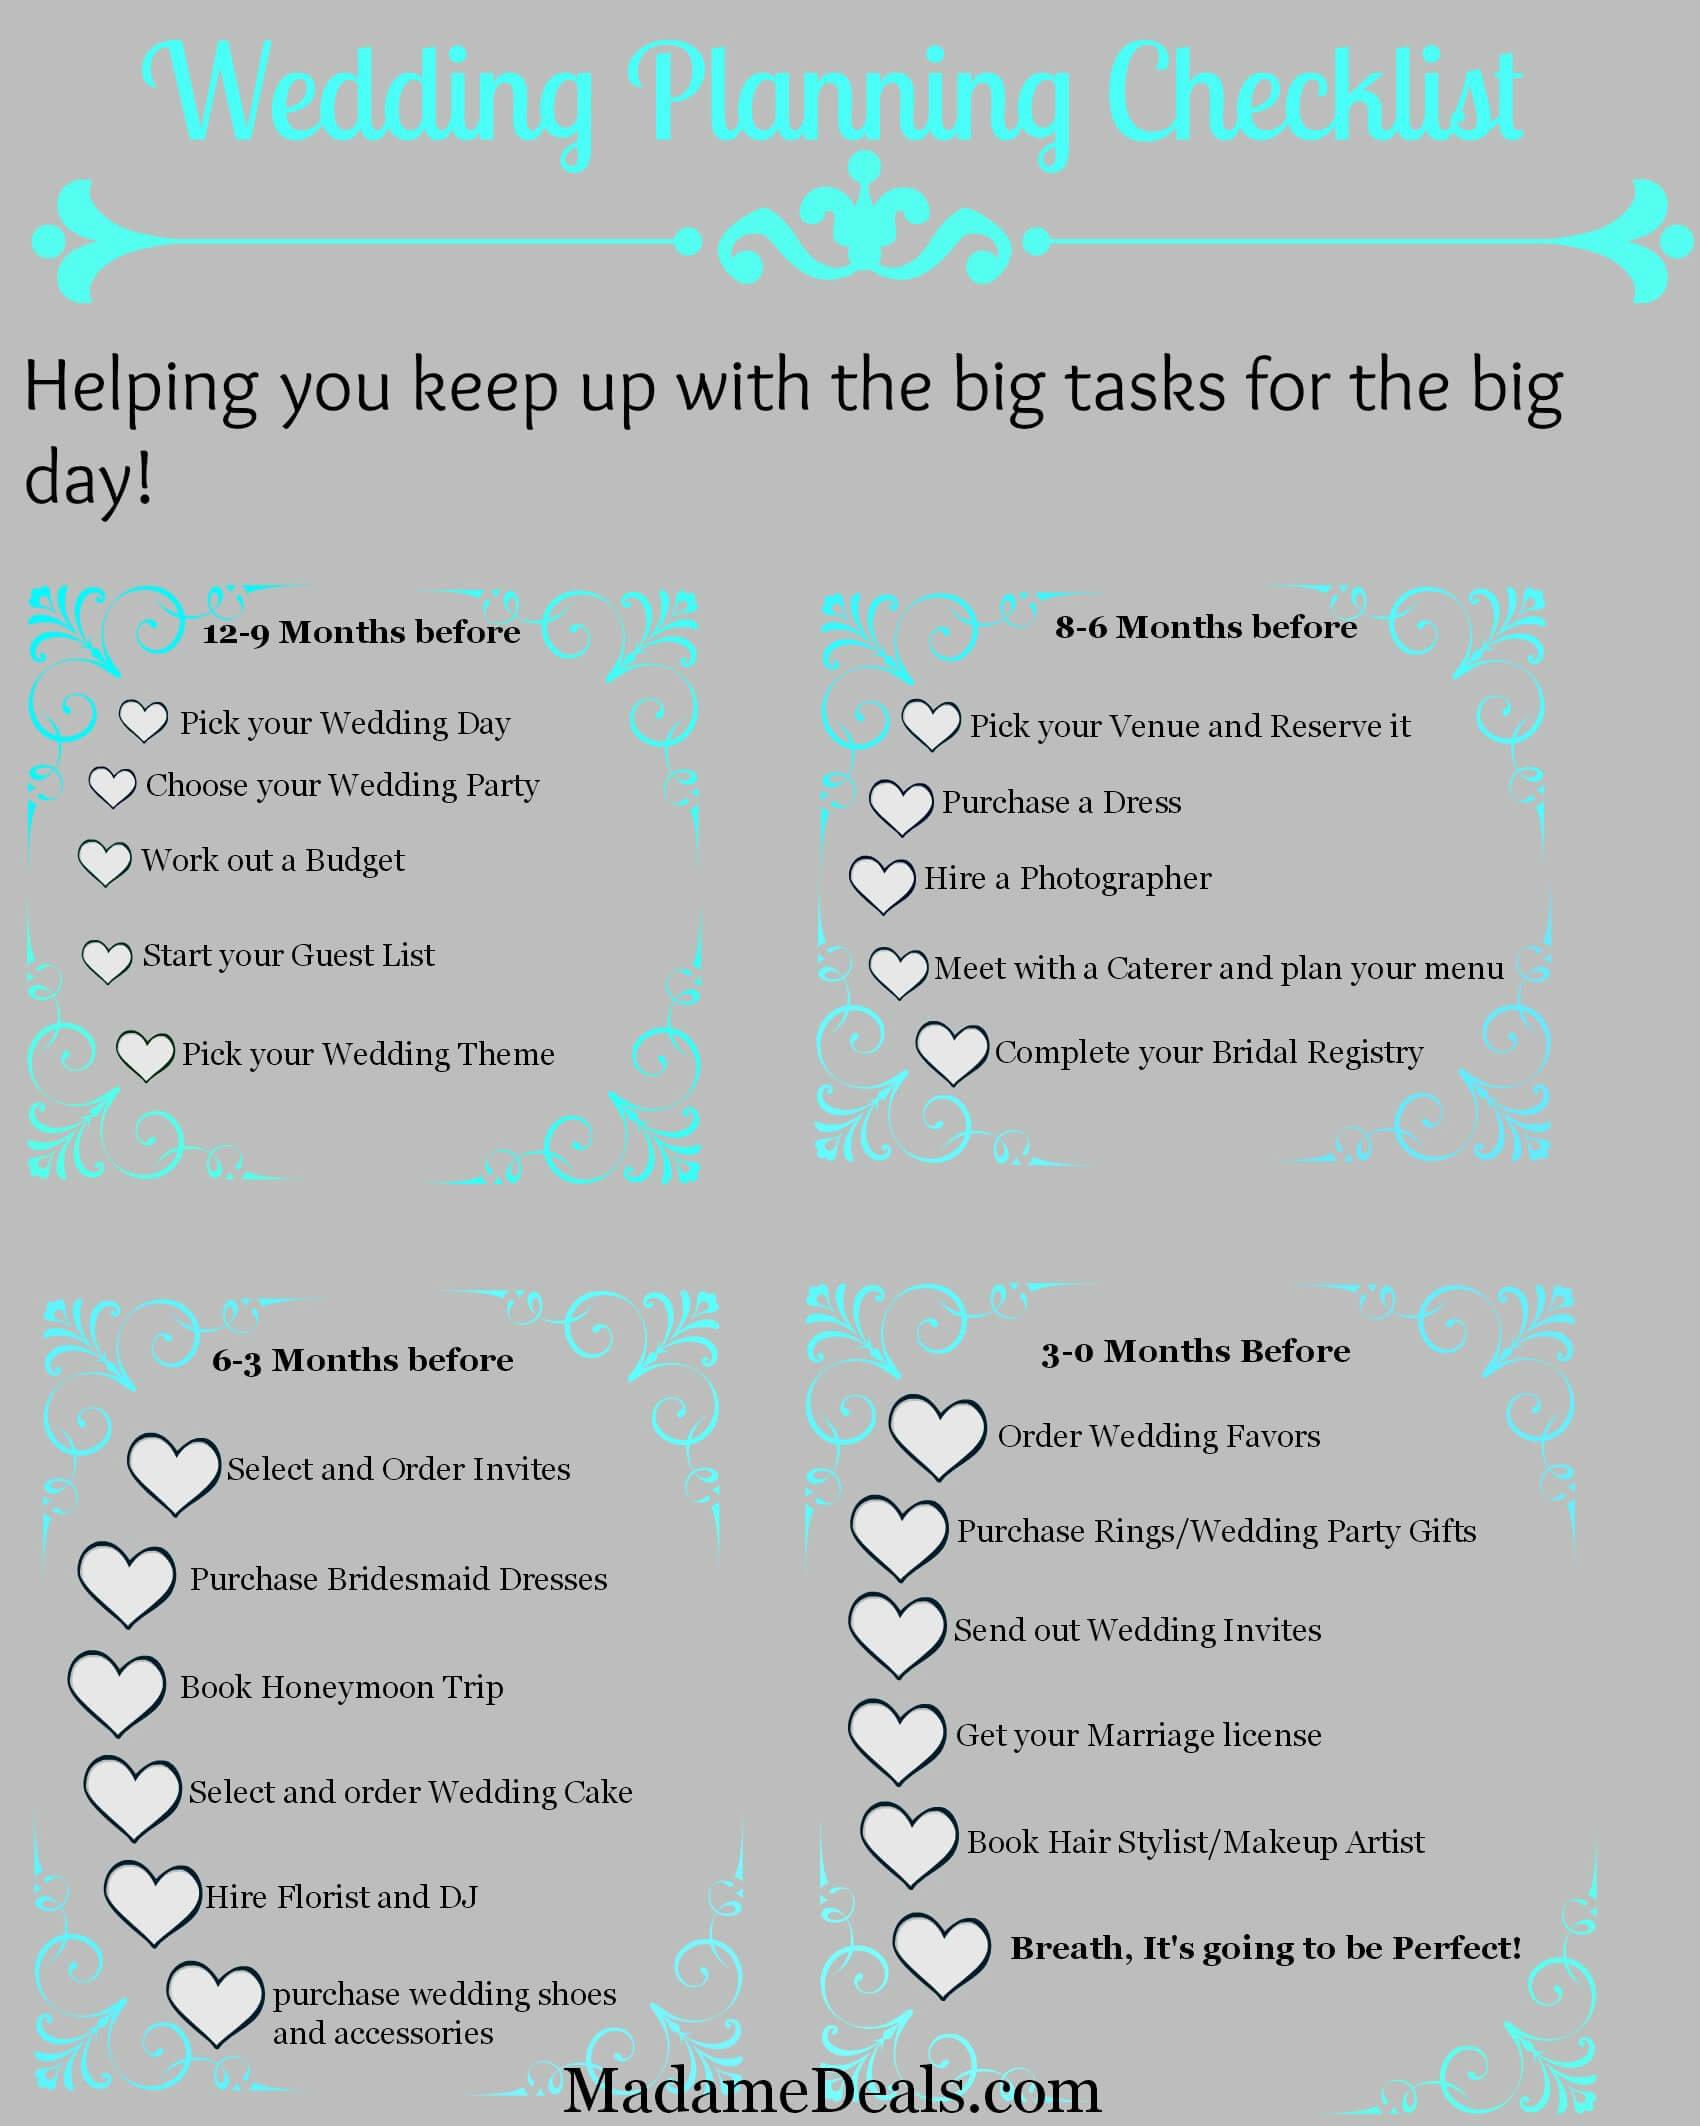 Free Printable Wedding Planning Checklist - Real Advice Gal - Free Printable Wedding Checklist